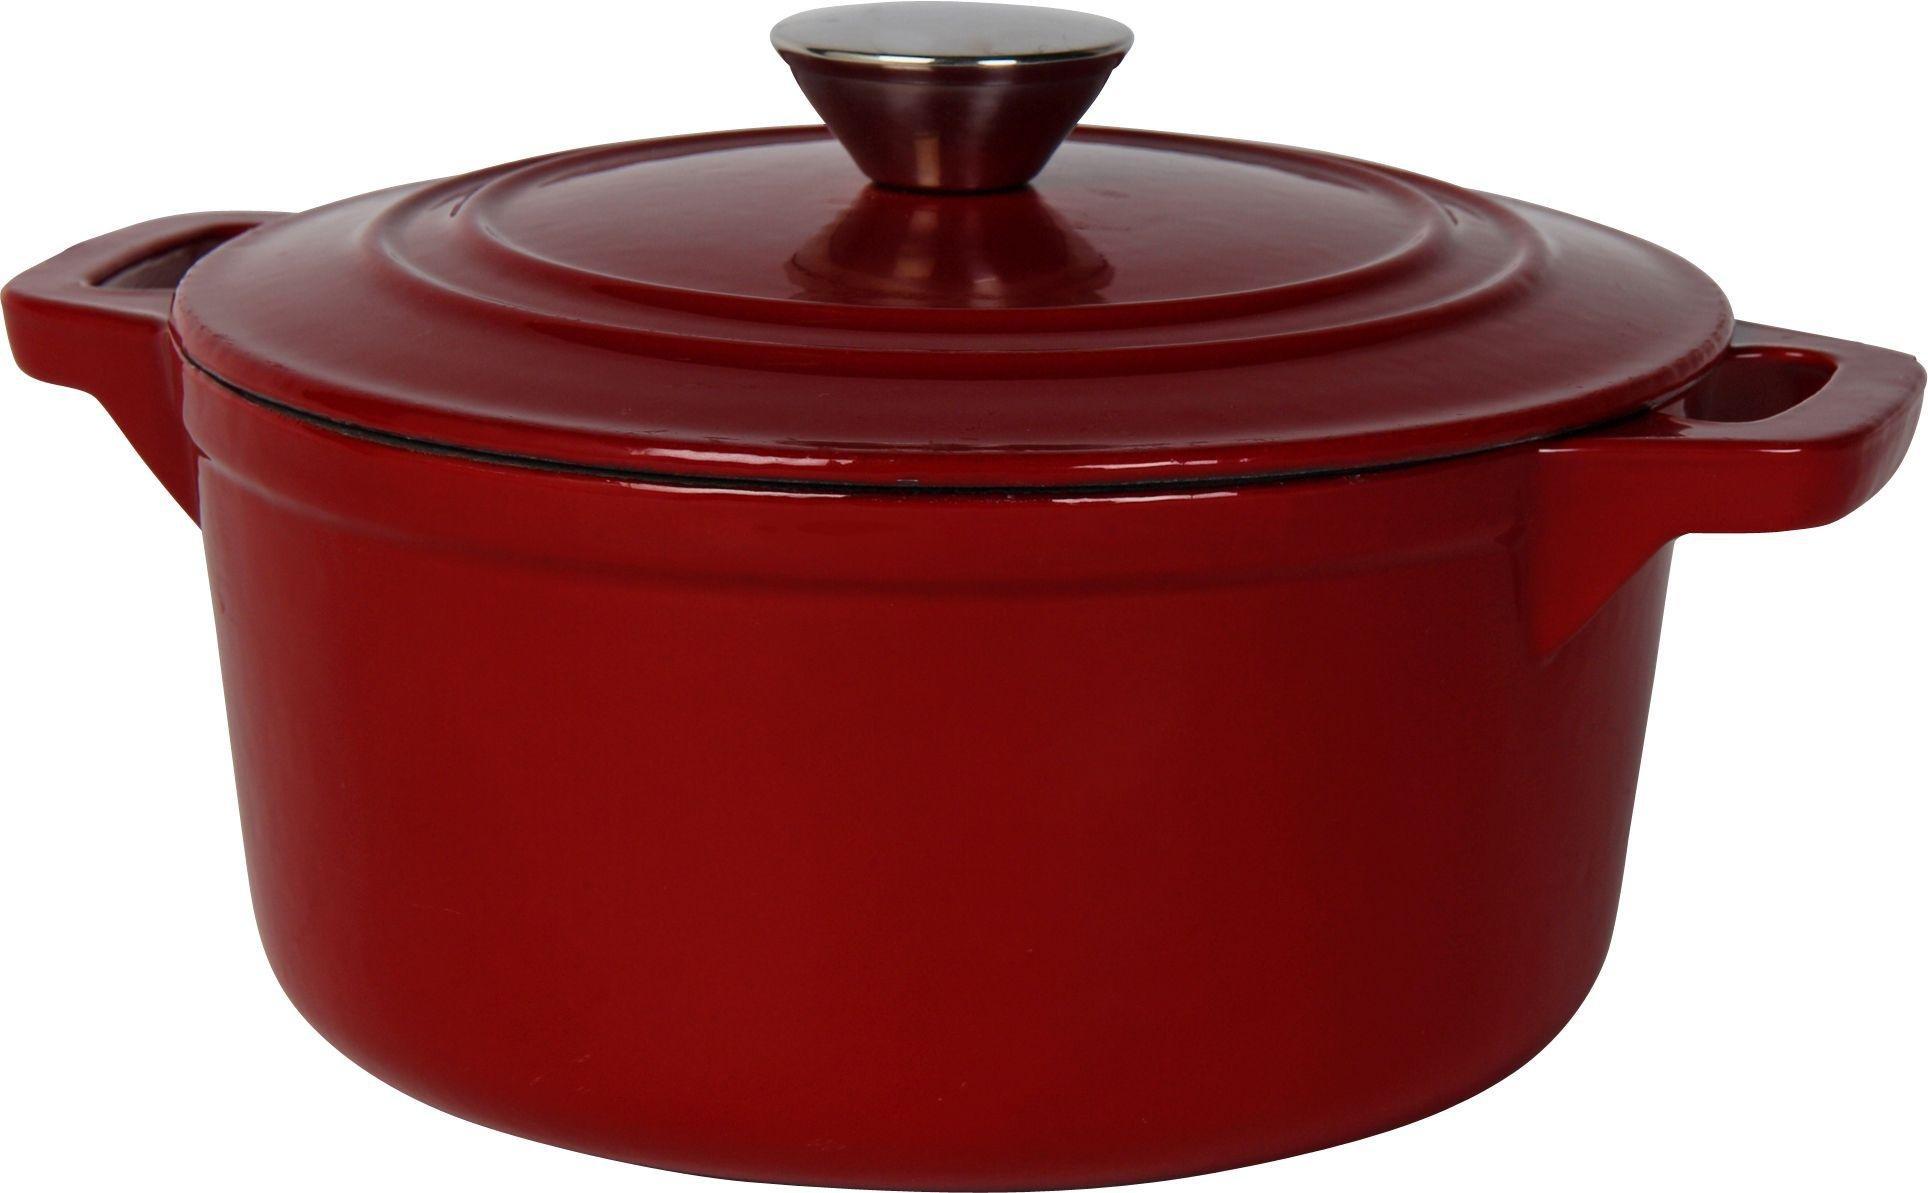 Image of Heart of House 21cm Circular Cast Iron Casserole Dish